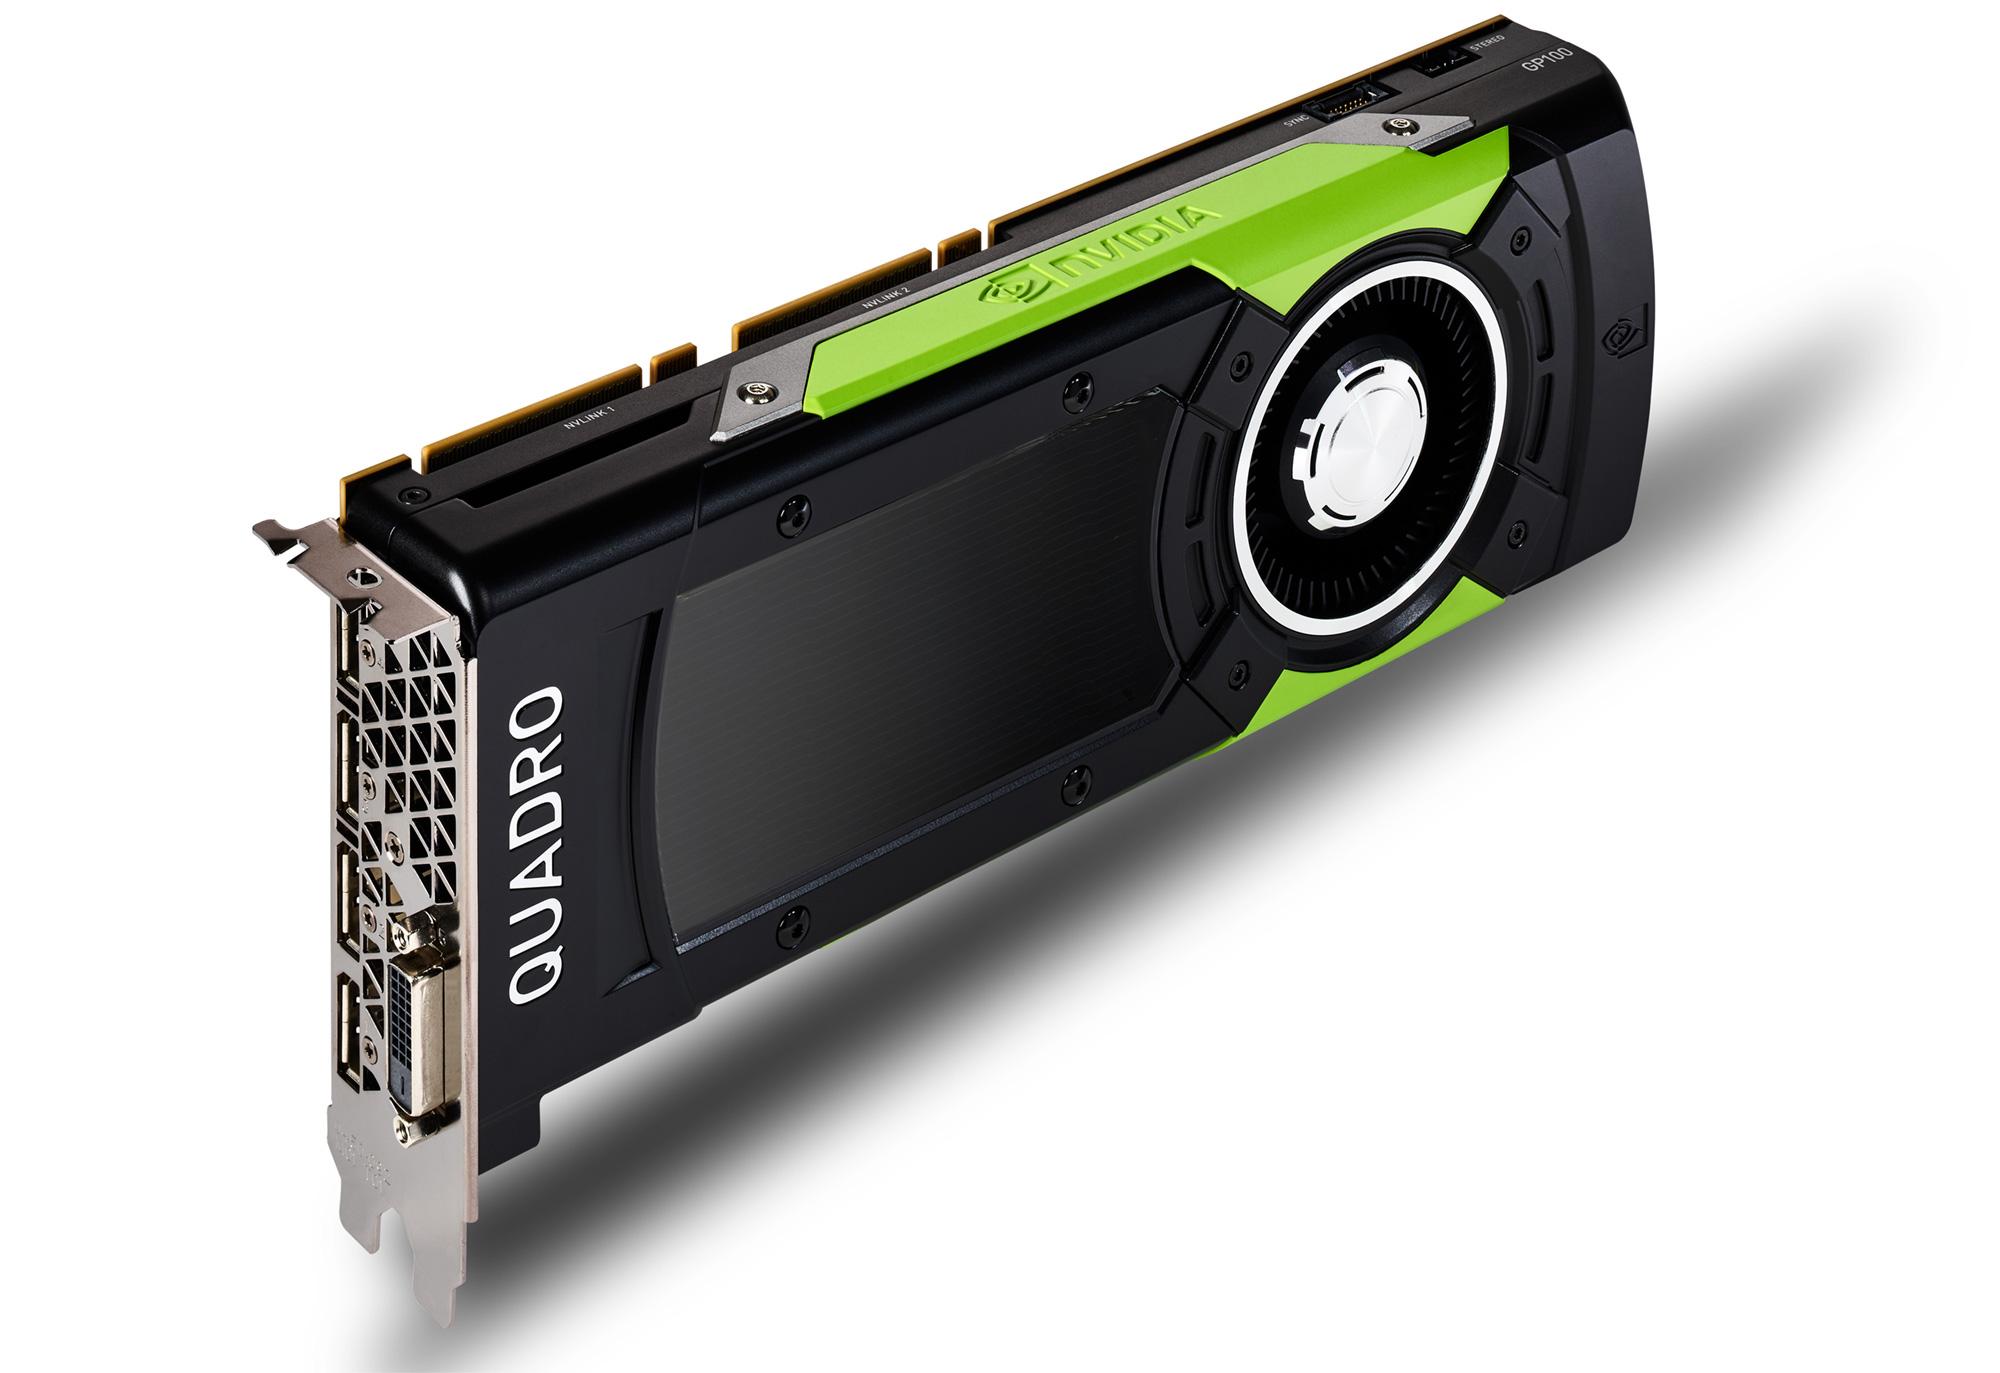 Nvidia bringt größten Pascal-Chip als Workstation Karte - Quadro GP100